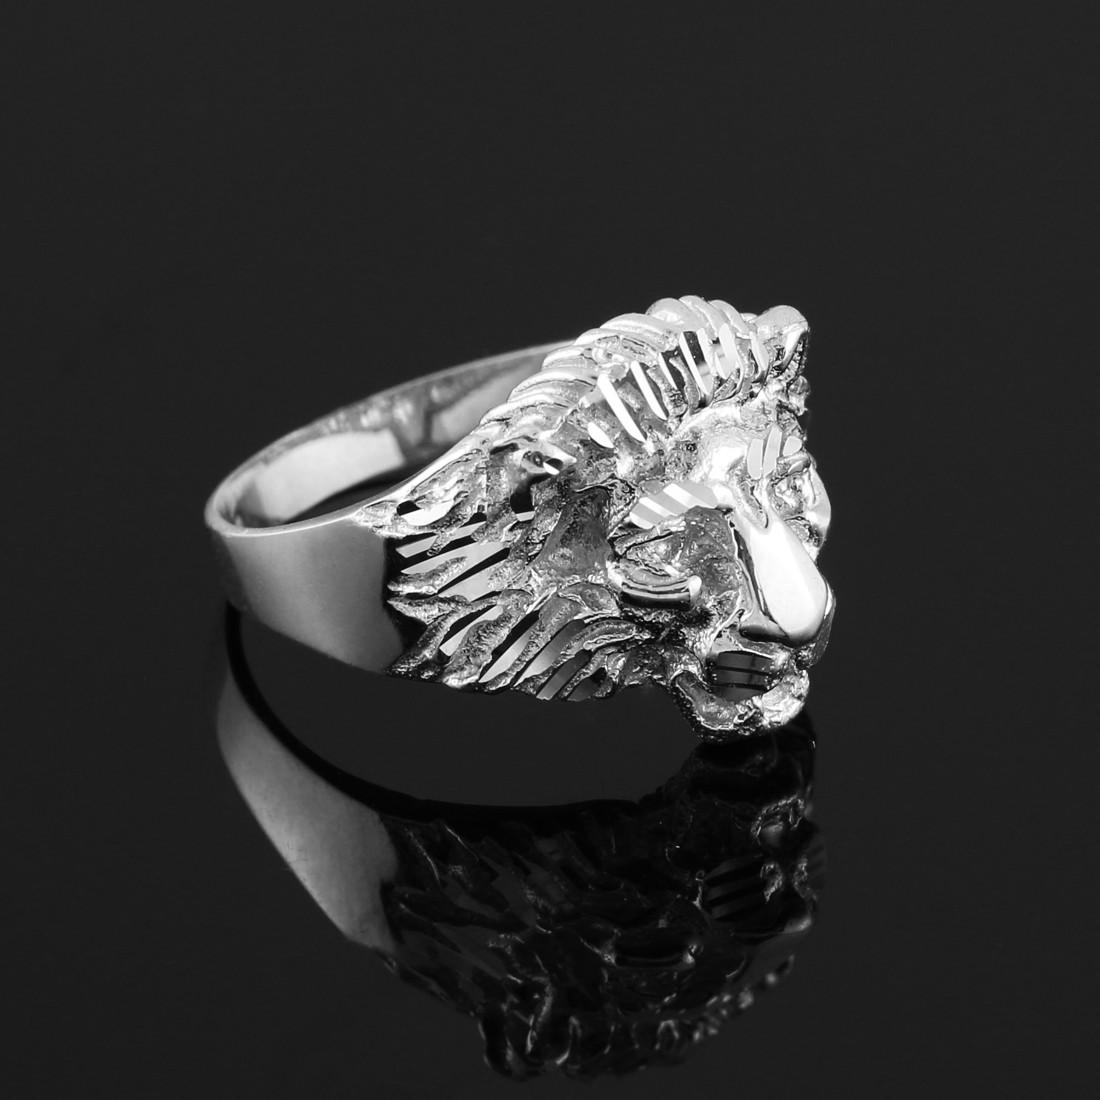 Ebay Old Ring Silver  Lion